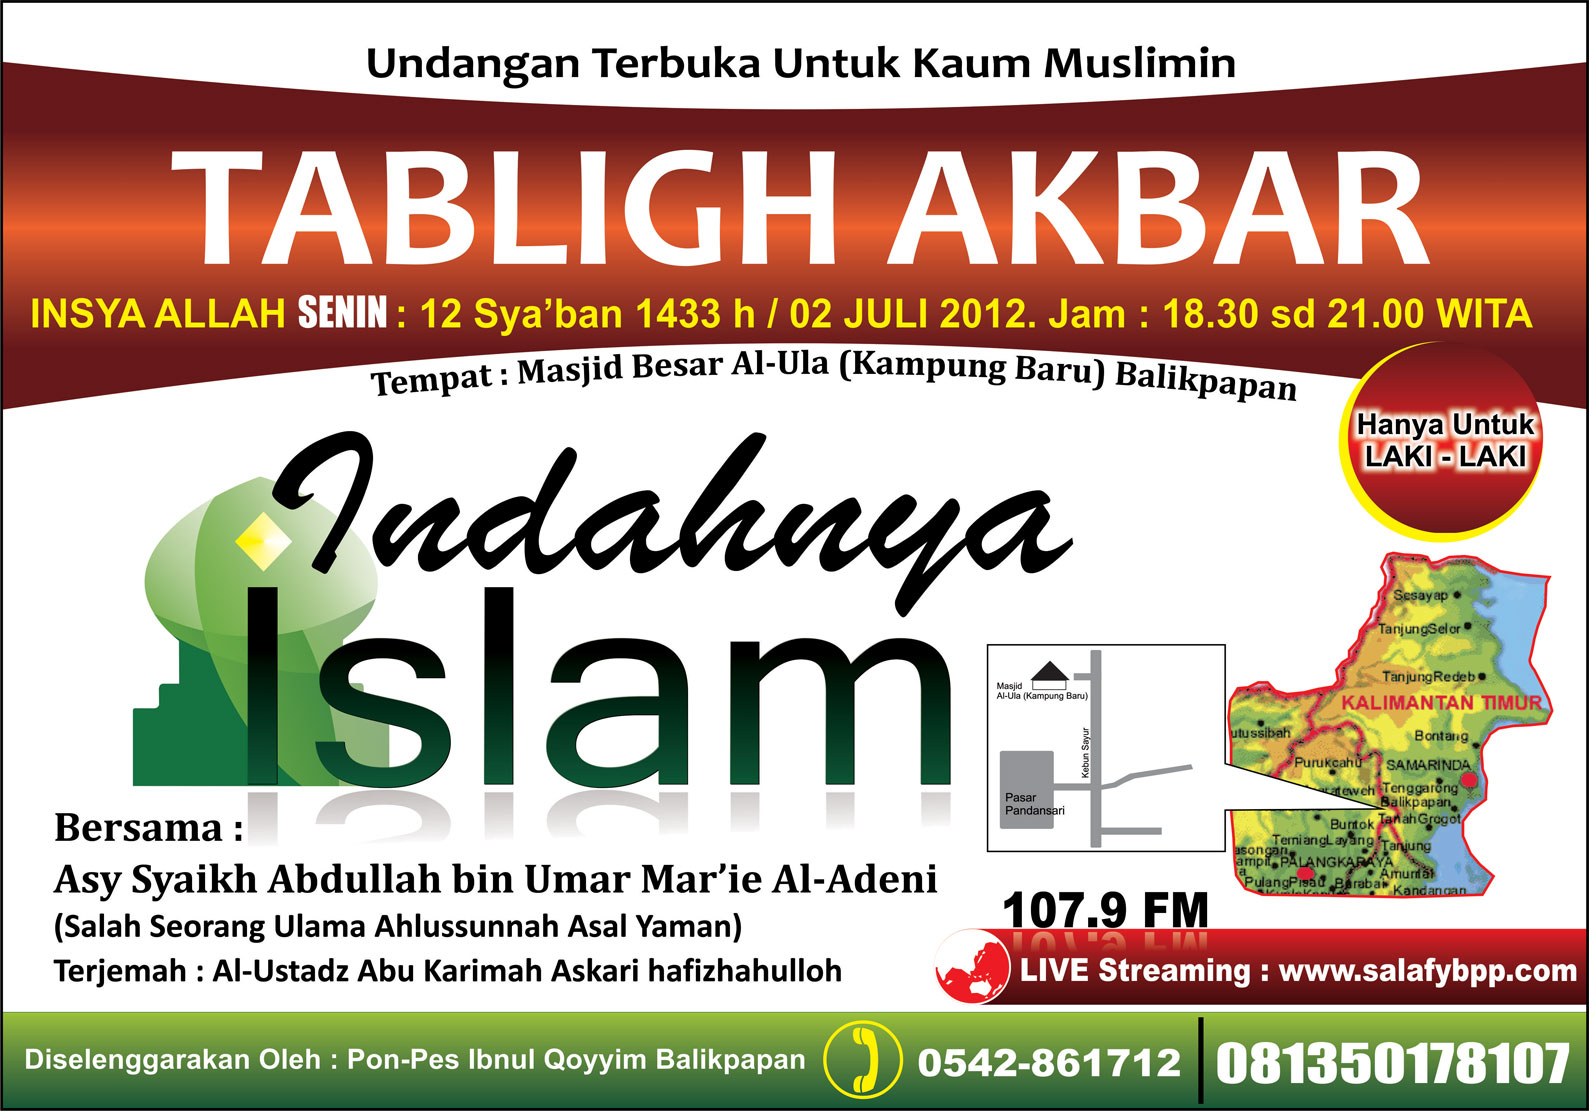 Tabligh Akbar Indahnya Islam Sesungguhnya Ilmu Itu Didapat Dg